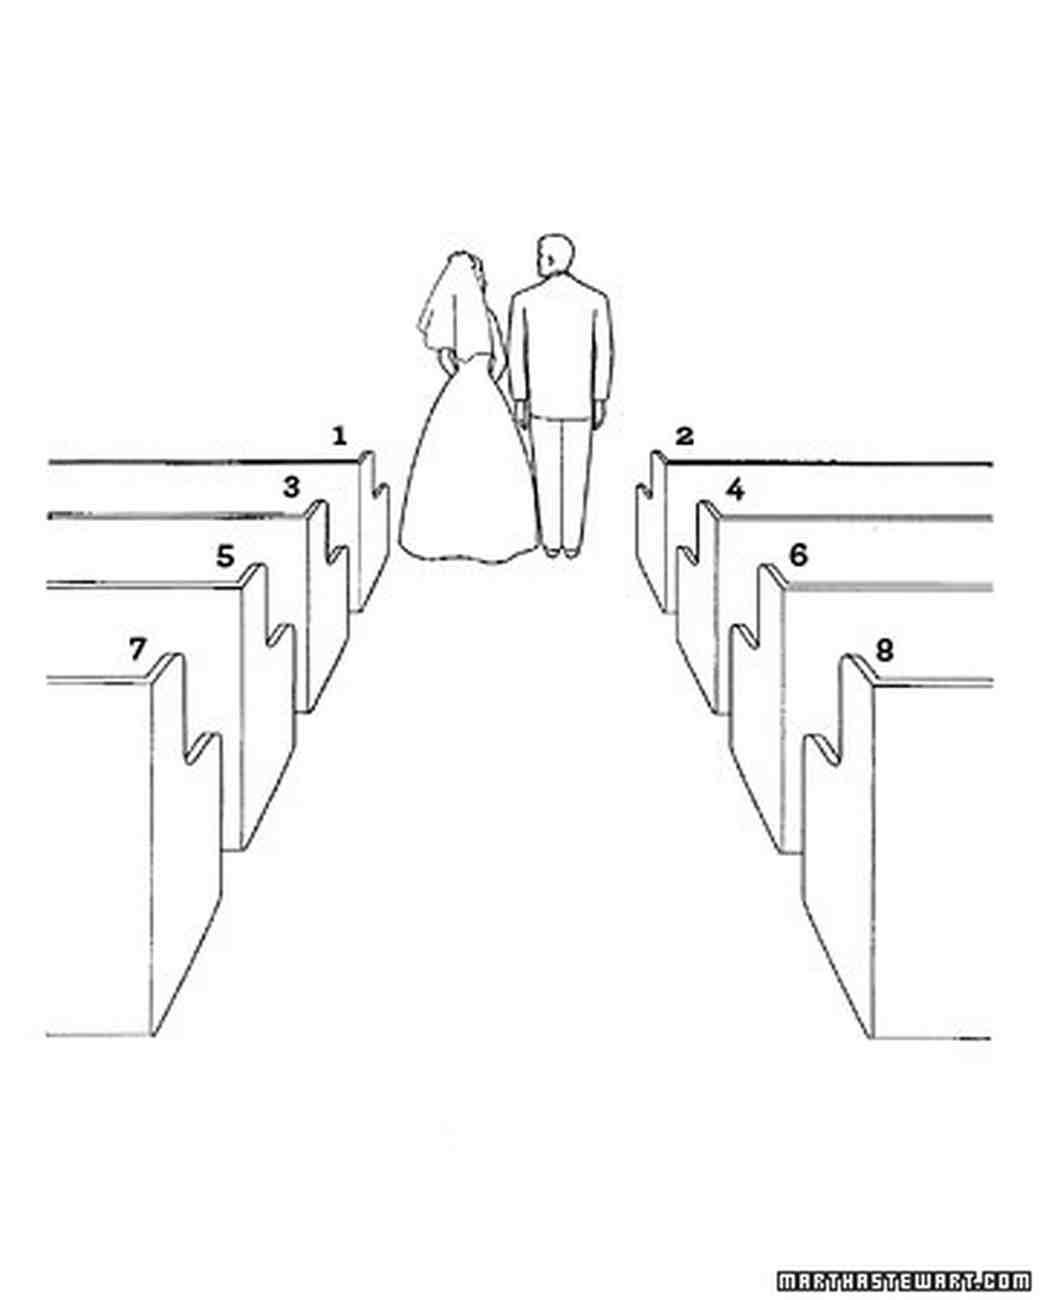 wa_win98_seatingc_xl?itok=Dkuxb vL diagram your big day christian wedding ceremony basics martha